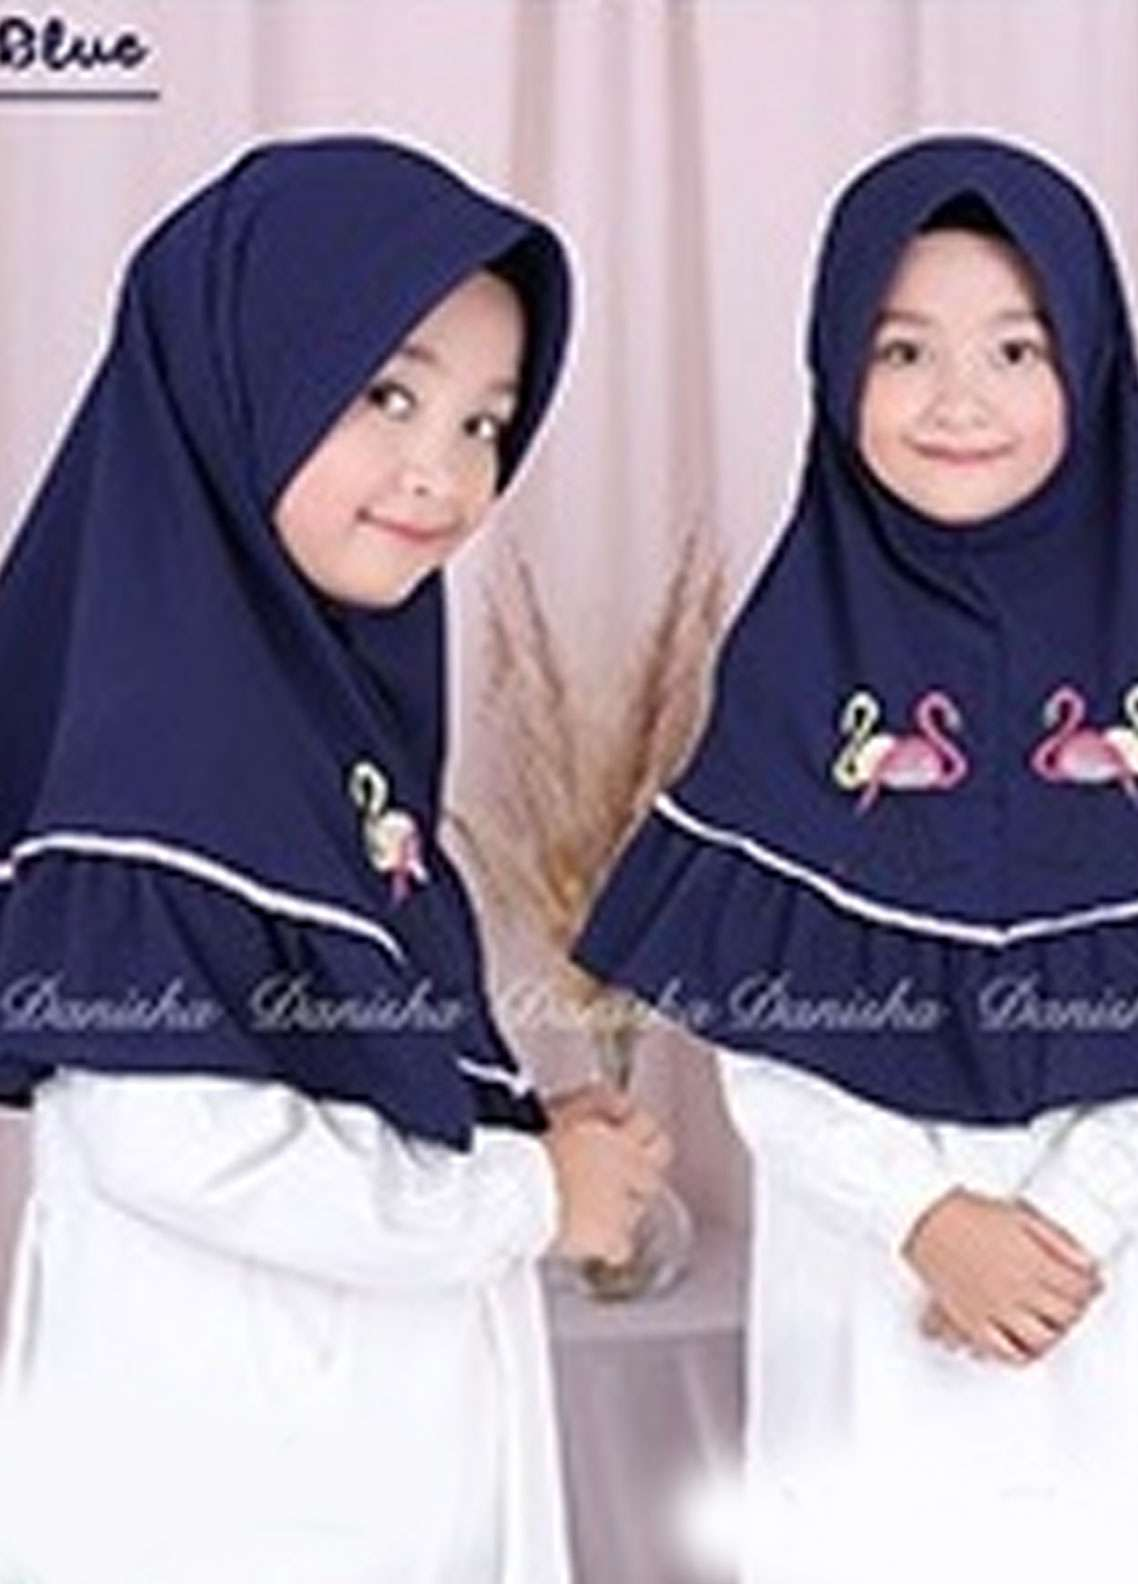 Danisha | Style of Hijab  Bubble Pop  Girls Scarves HH Danisha Flamingo 05 Navy Blue